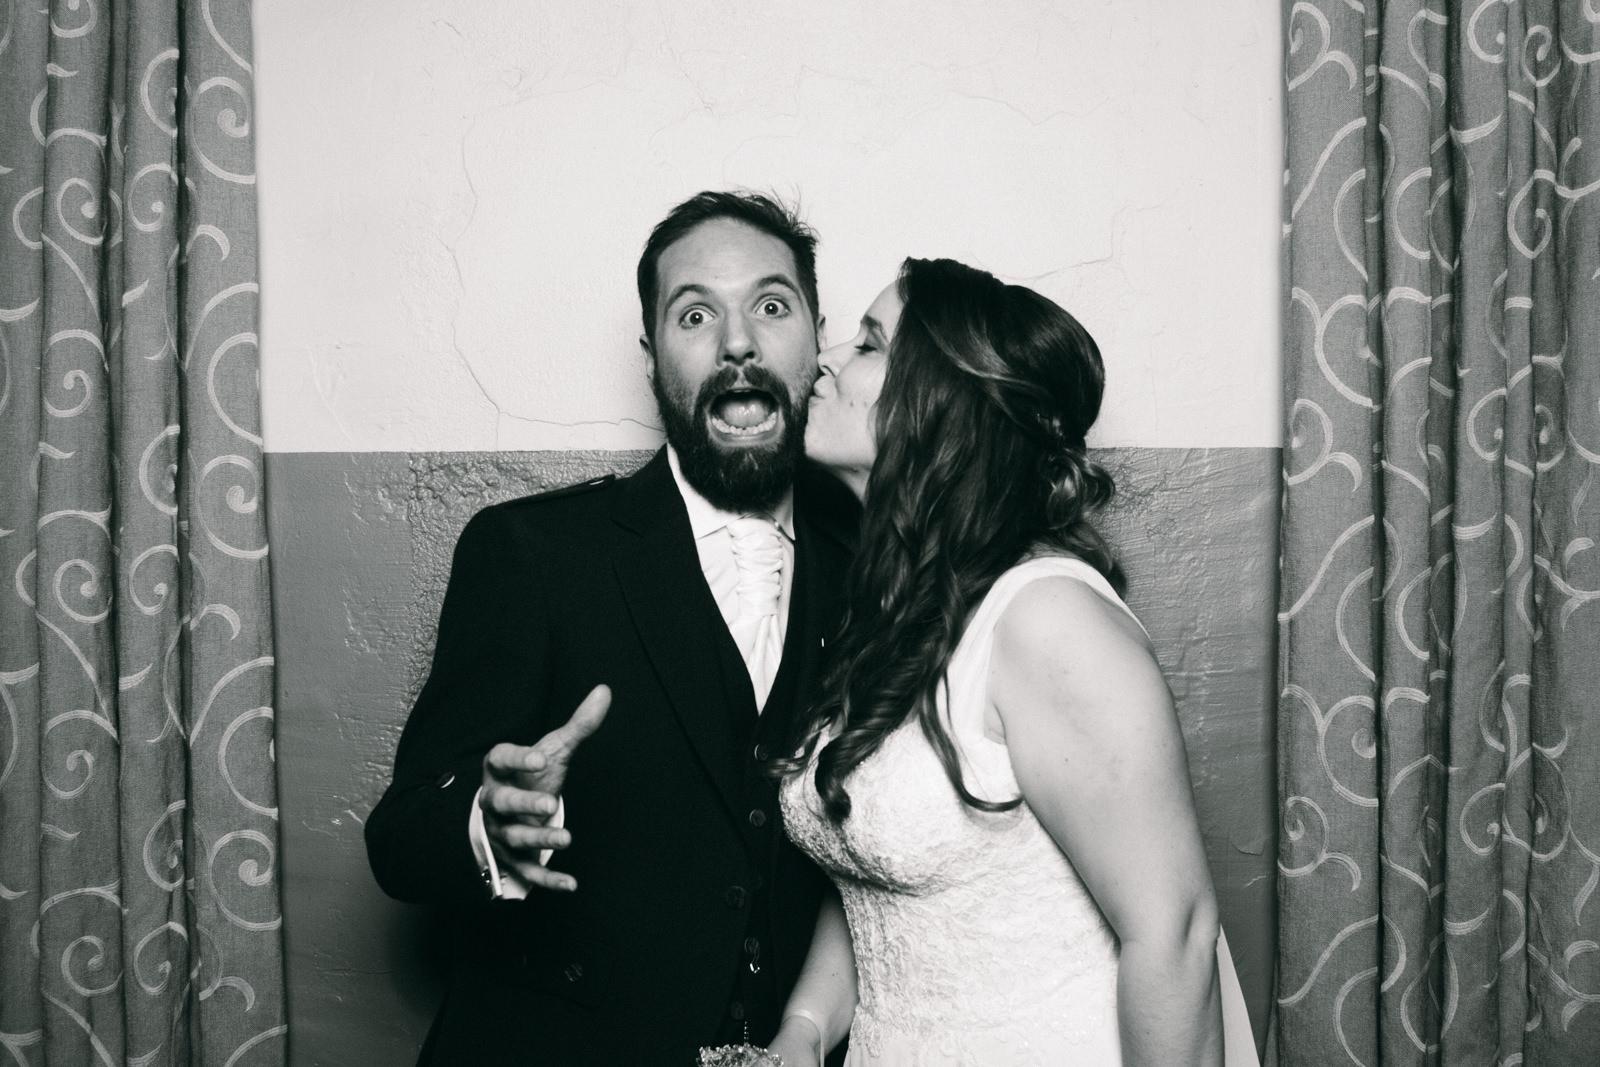 Tara-Dan-Wedding-Photo-Booth-Allentown-Brew-Works-10.jpg